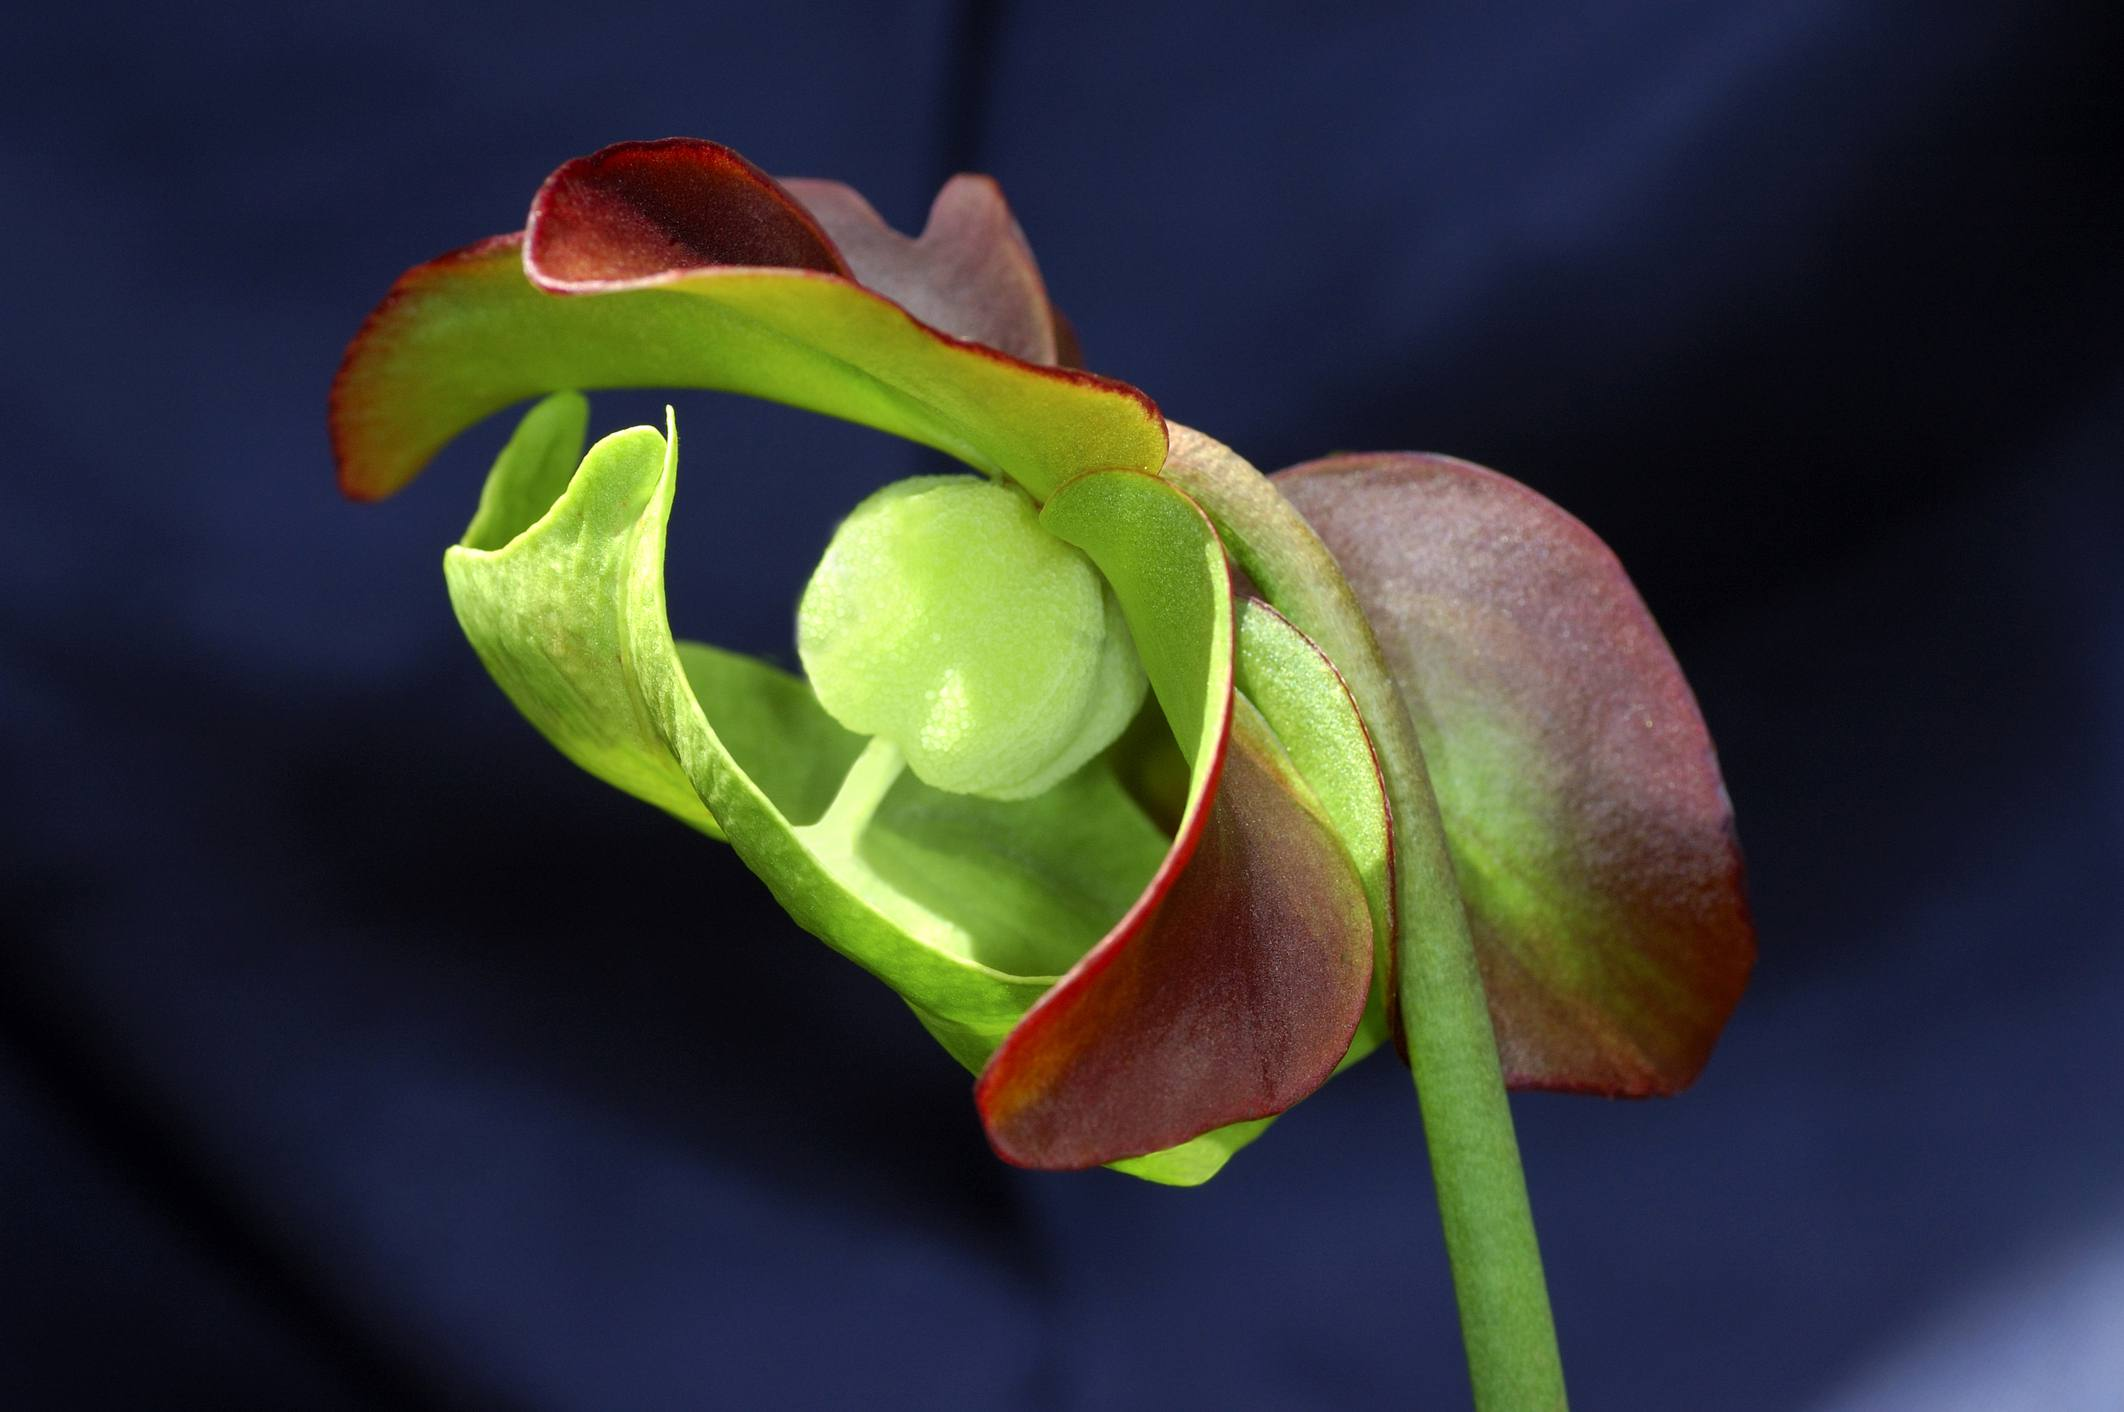 Flower of purple pitcher plant.